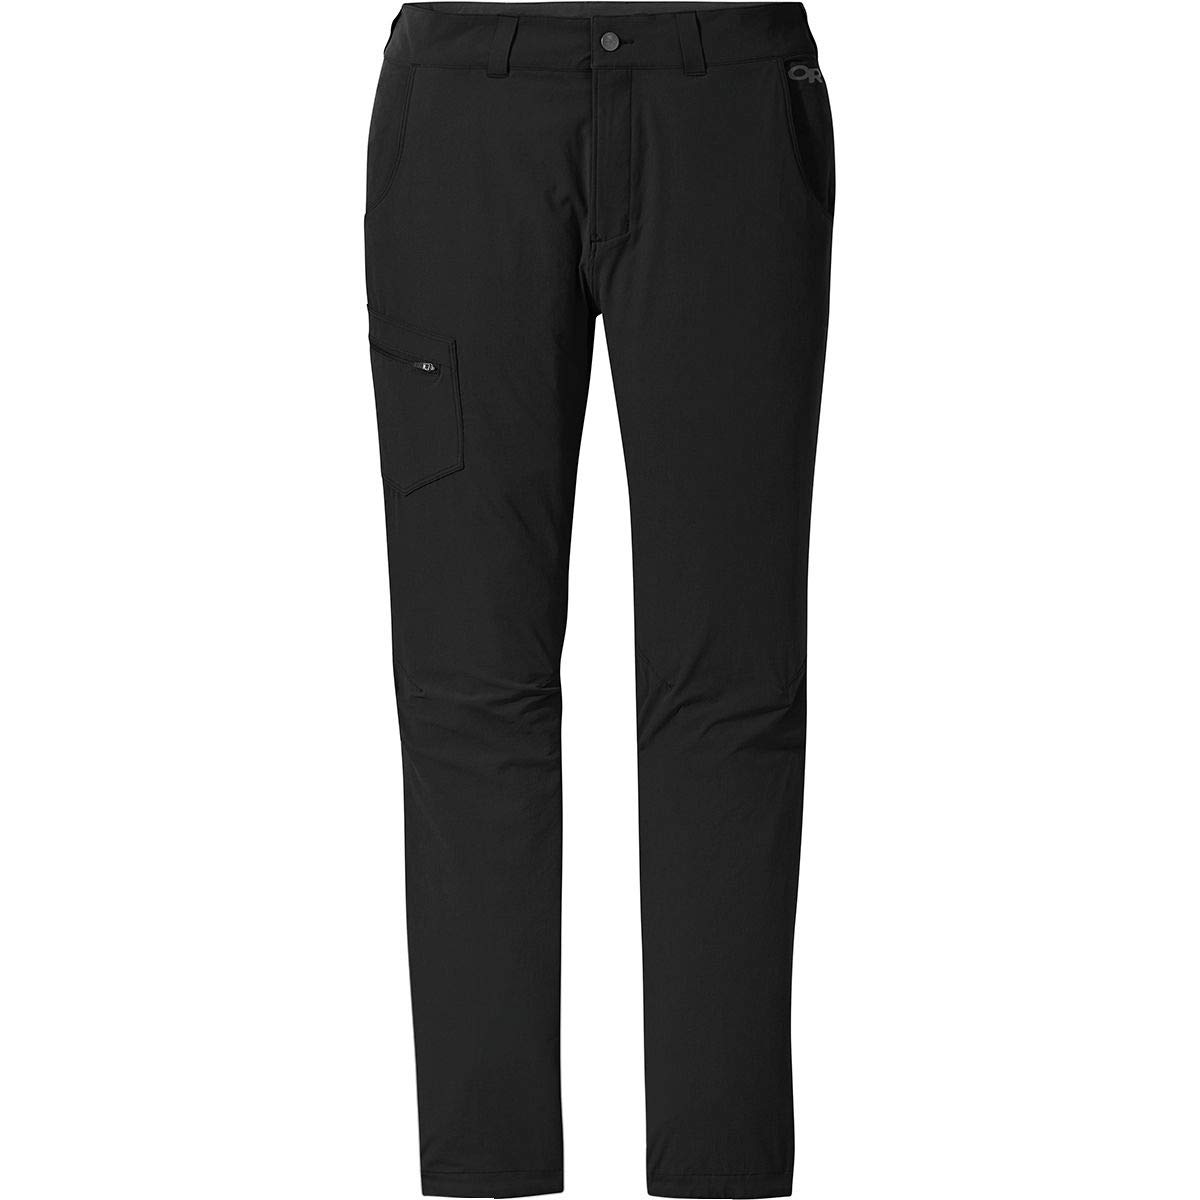 d20da55ace1e6f Amazon.com: Outdoor Research Men's Ferrosi Pants - 32